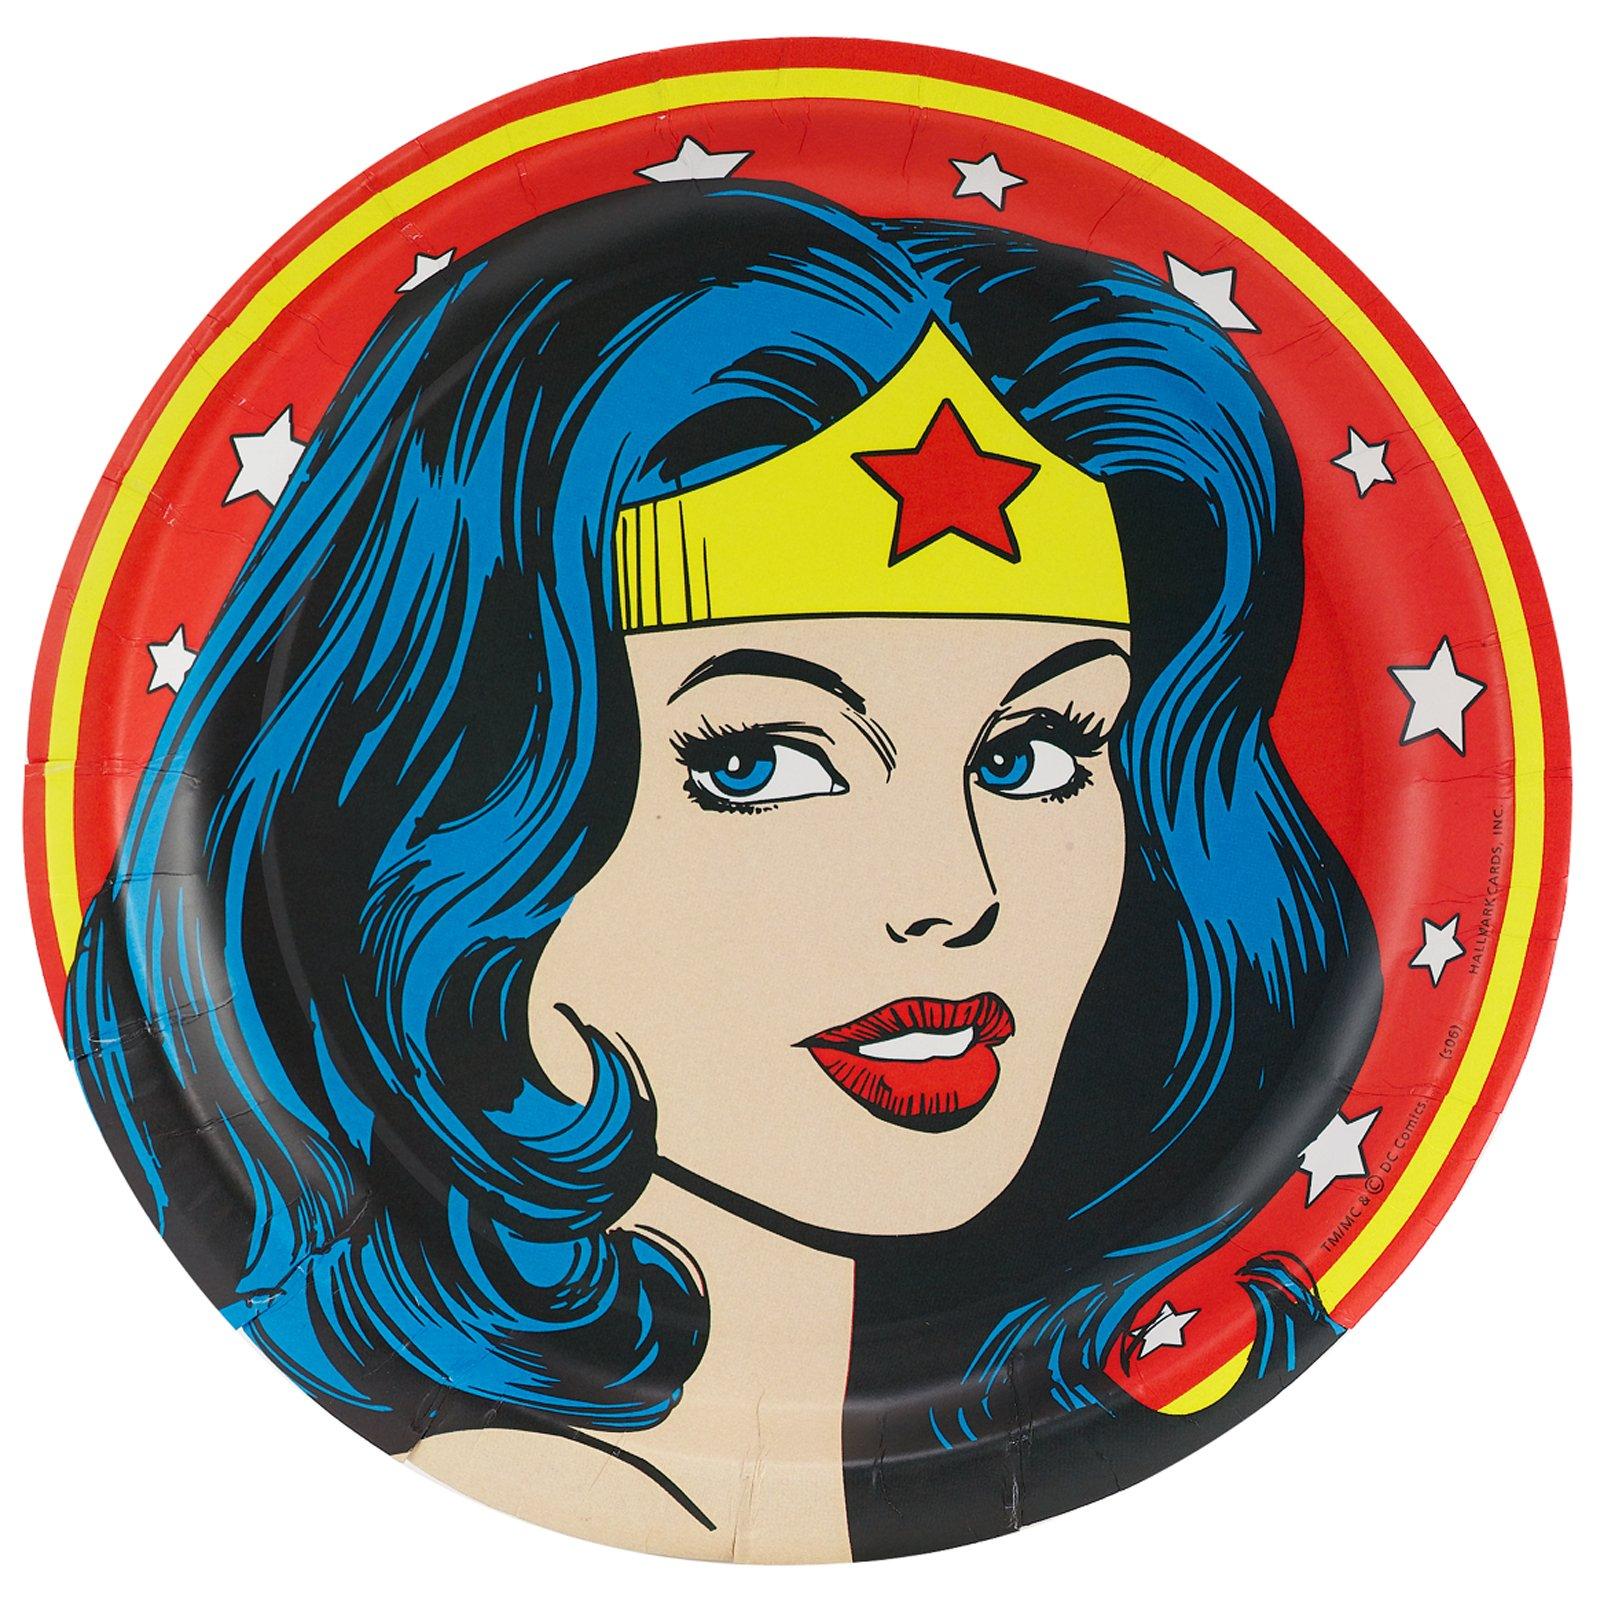 Shybiker: Wonder Woman!